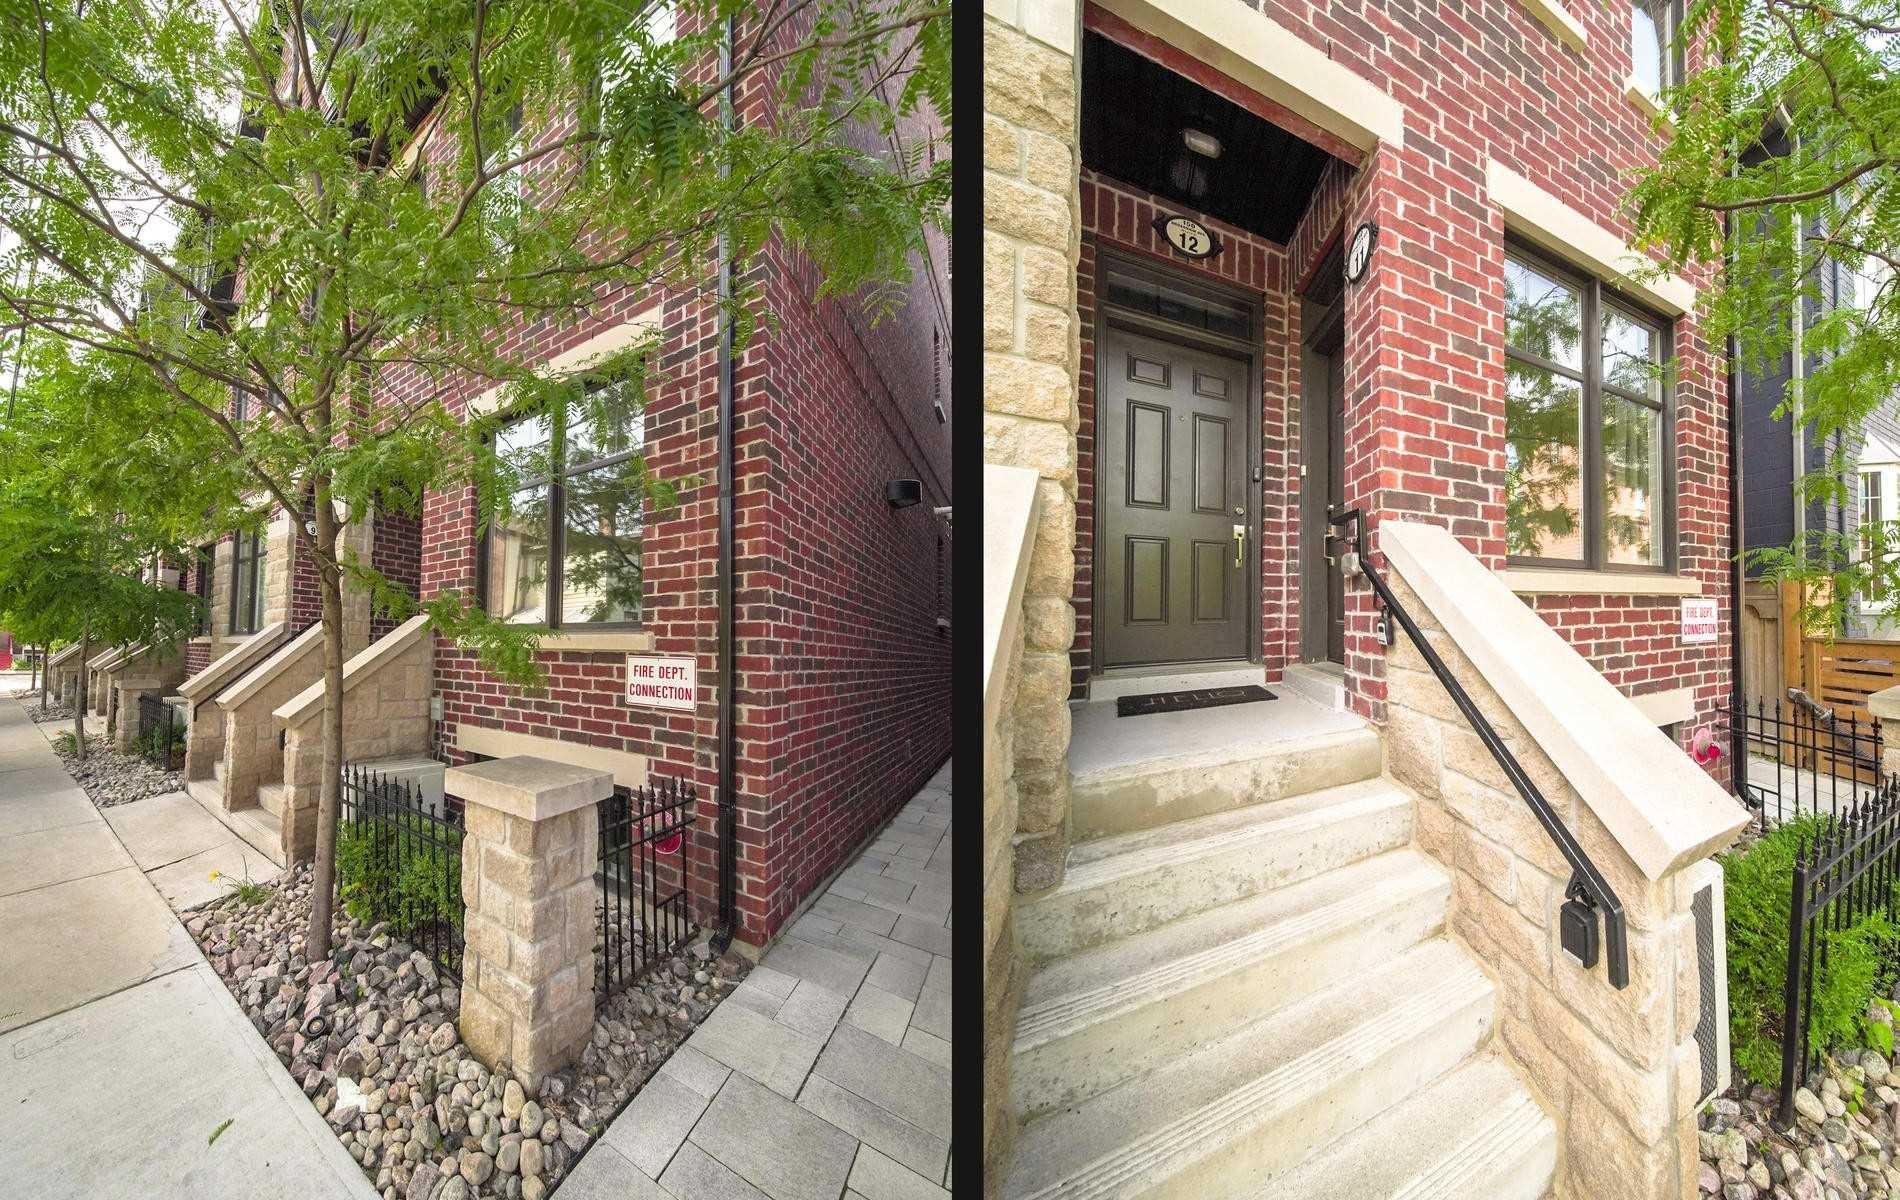 Photo 15: Photos: Th 11 150 Broadview Avenue in Toronto: South Riverdale Condo for sale (Toronto E01)  : MLS®# E4519038